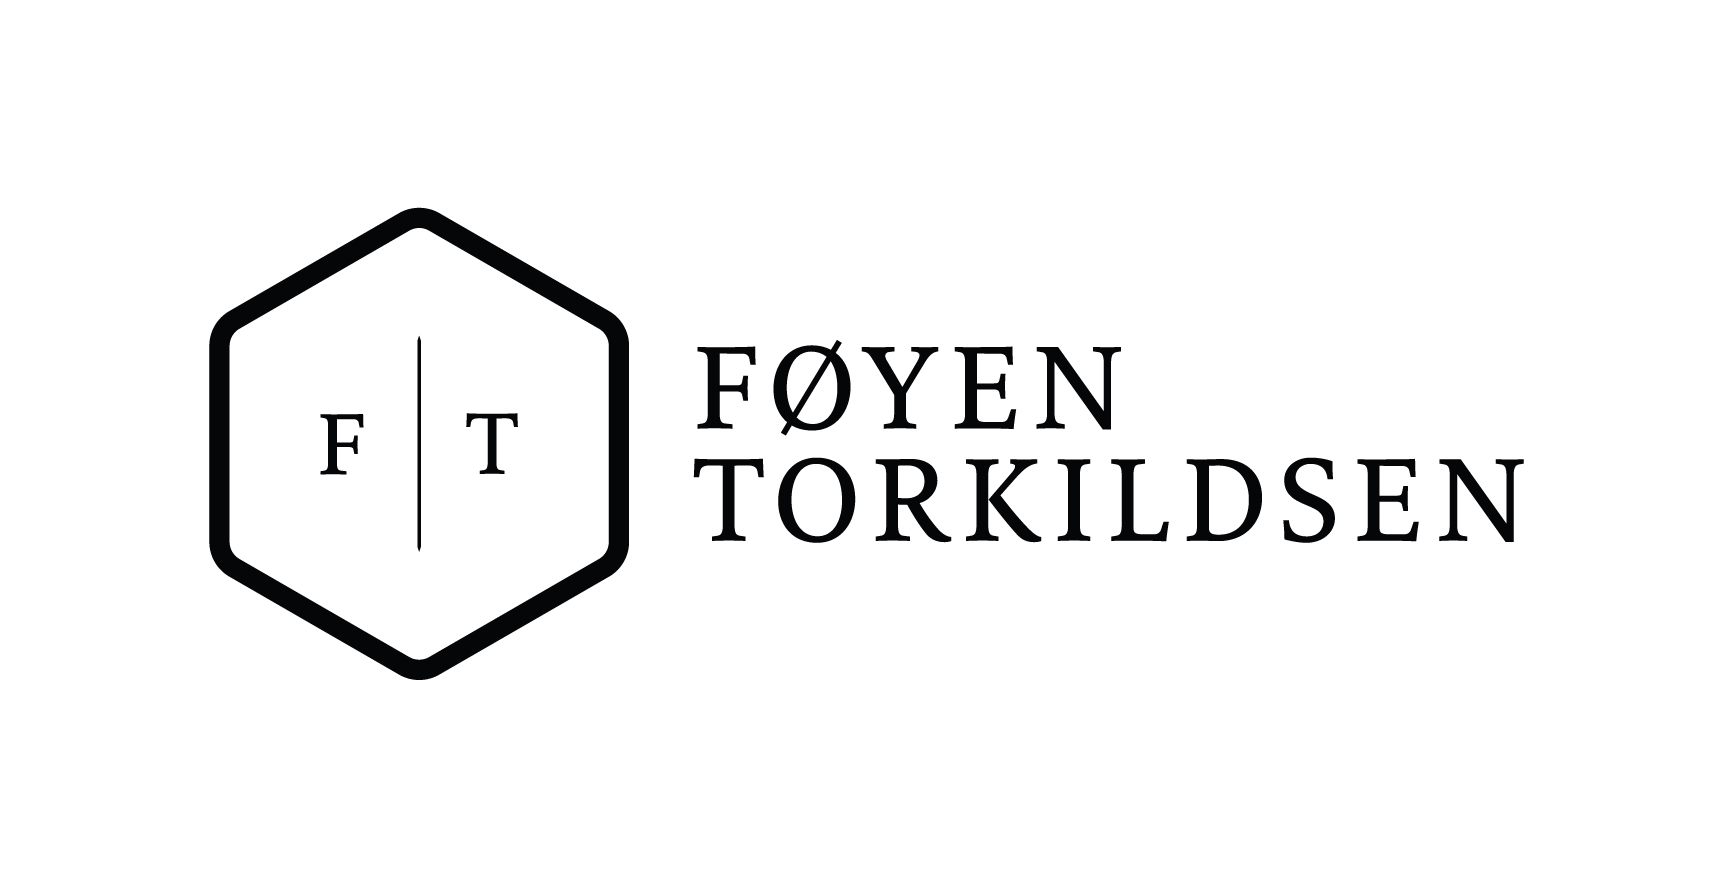 Føyen Torkildsen